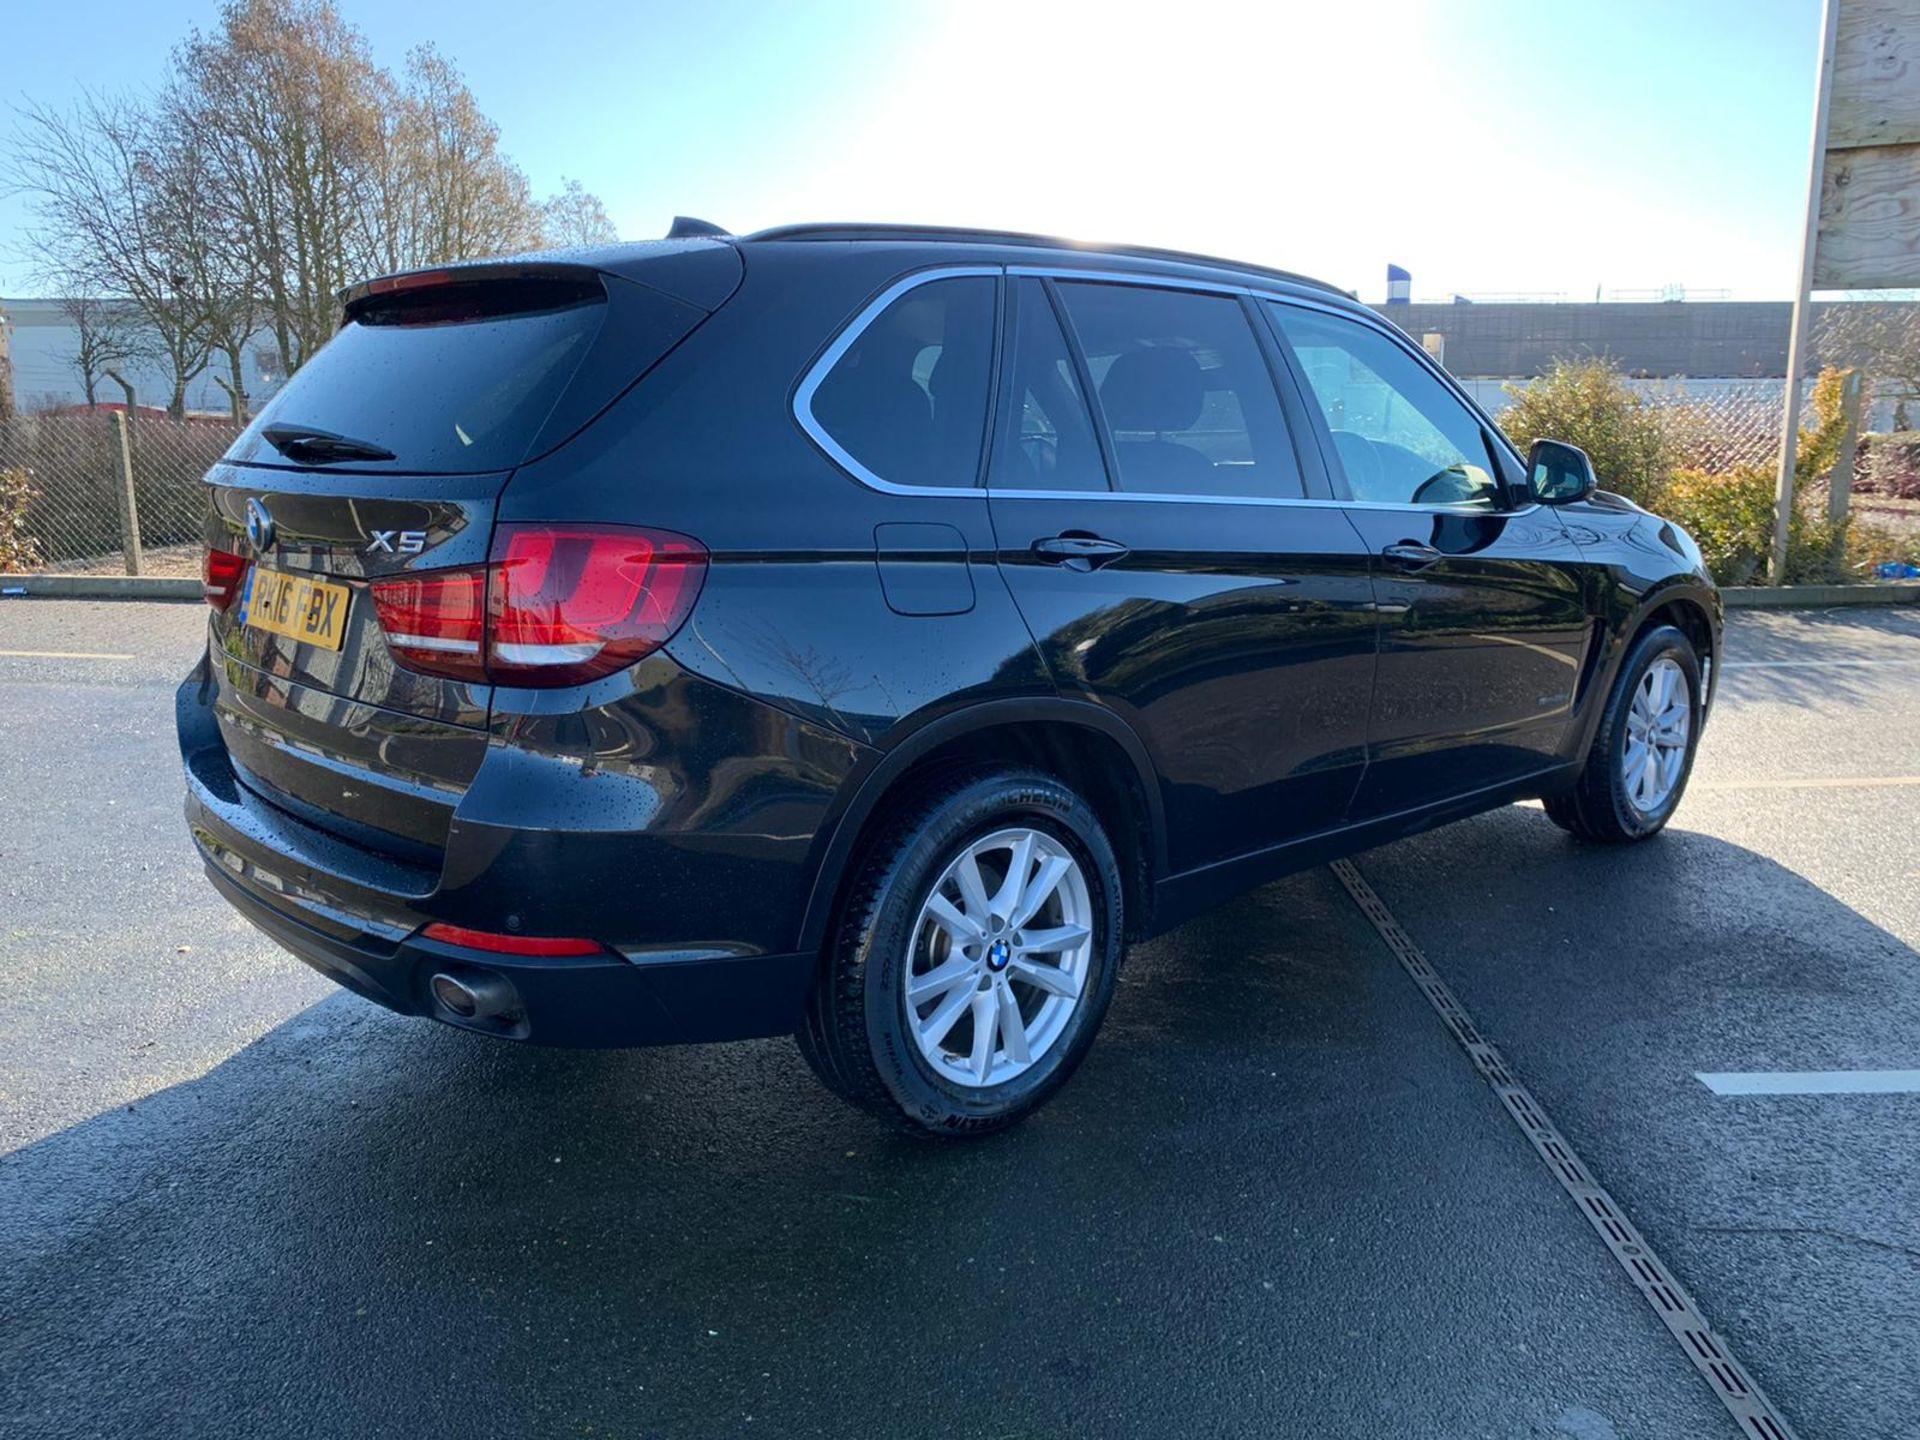 "(Reserve Met) BMW X5 2.0d S-DRIVE ""Special Equipment"" Auto- 7 Seater -16 Reg - Sat Nav- (New Shape) - Image 9 of 43"